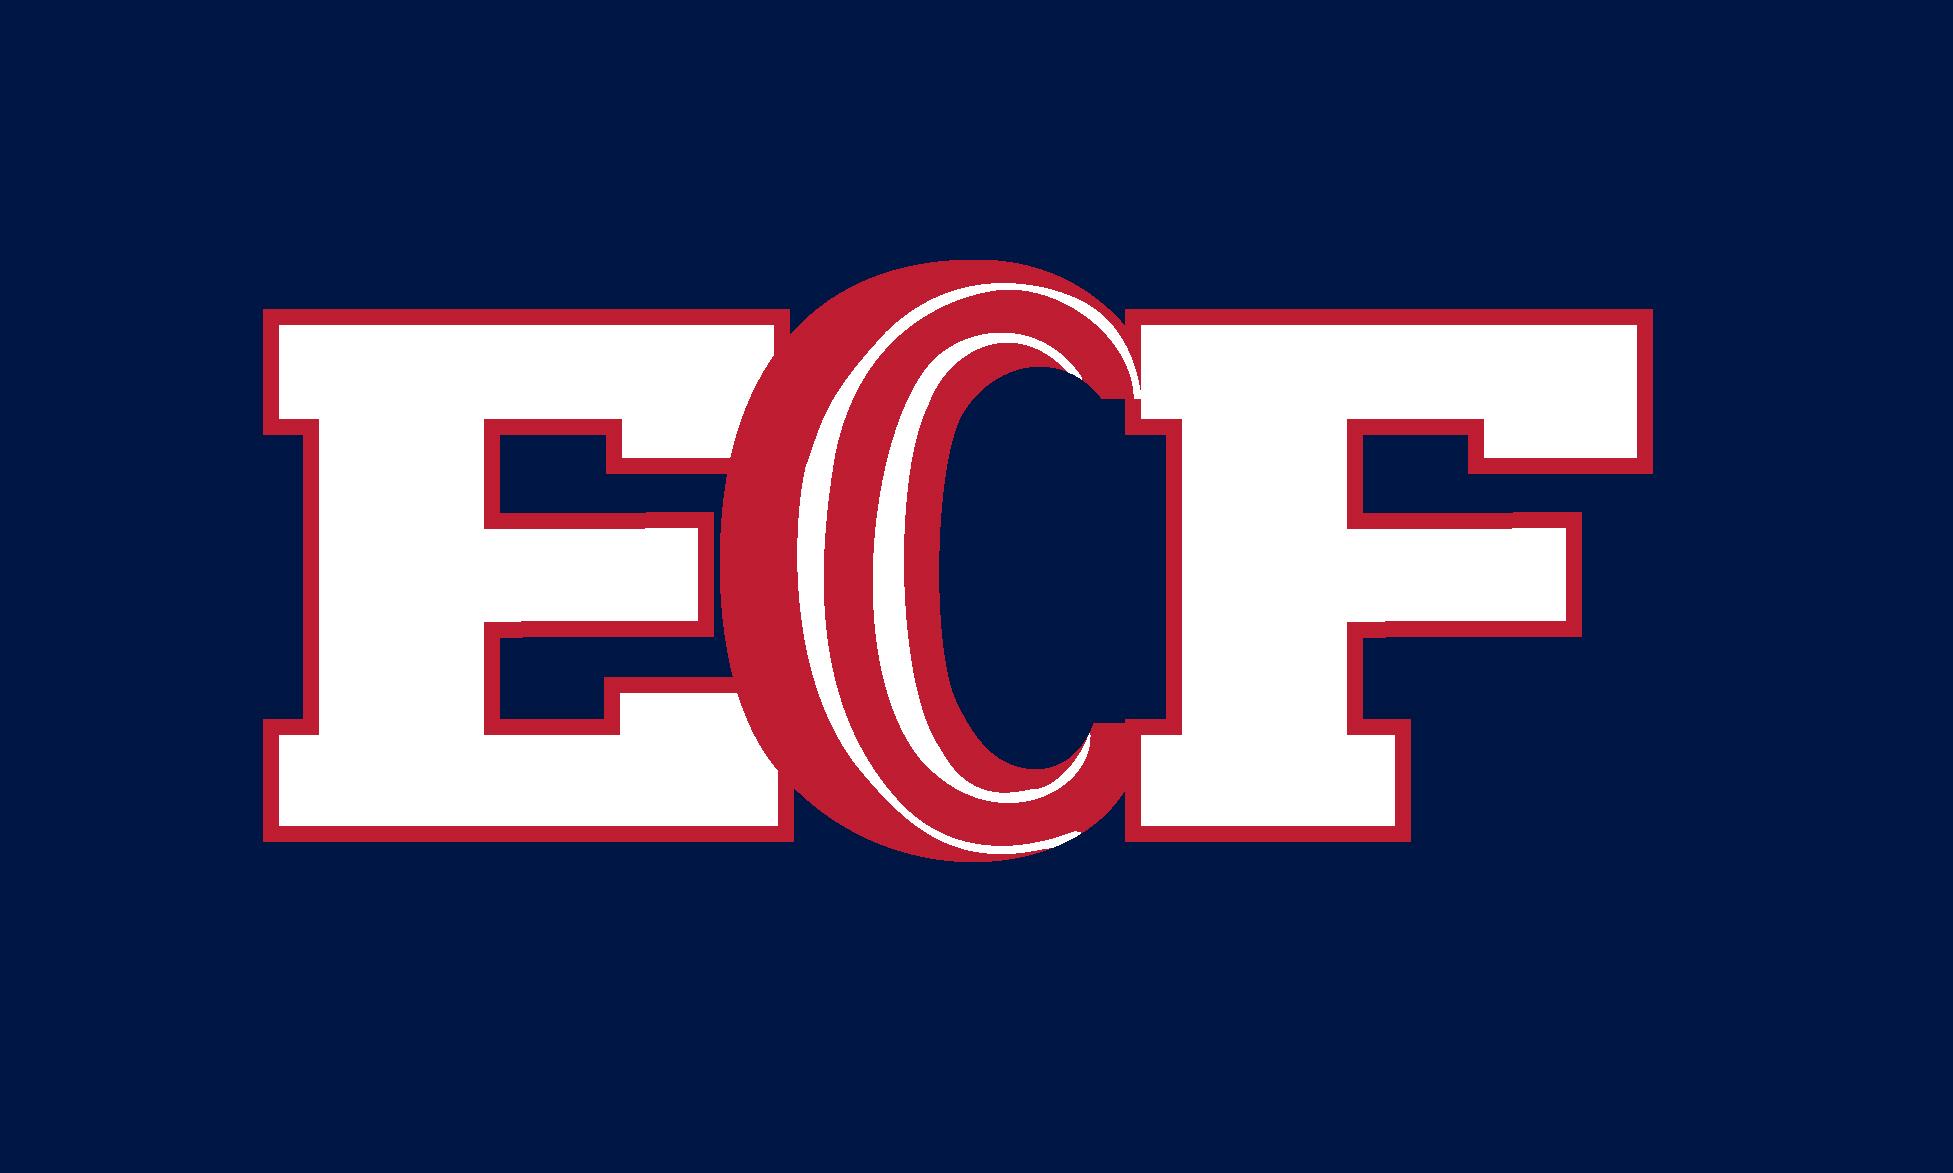 East Coast Firecrackers, Softball, Run, Play The Game